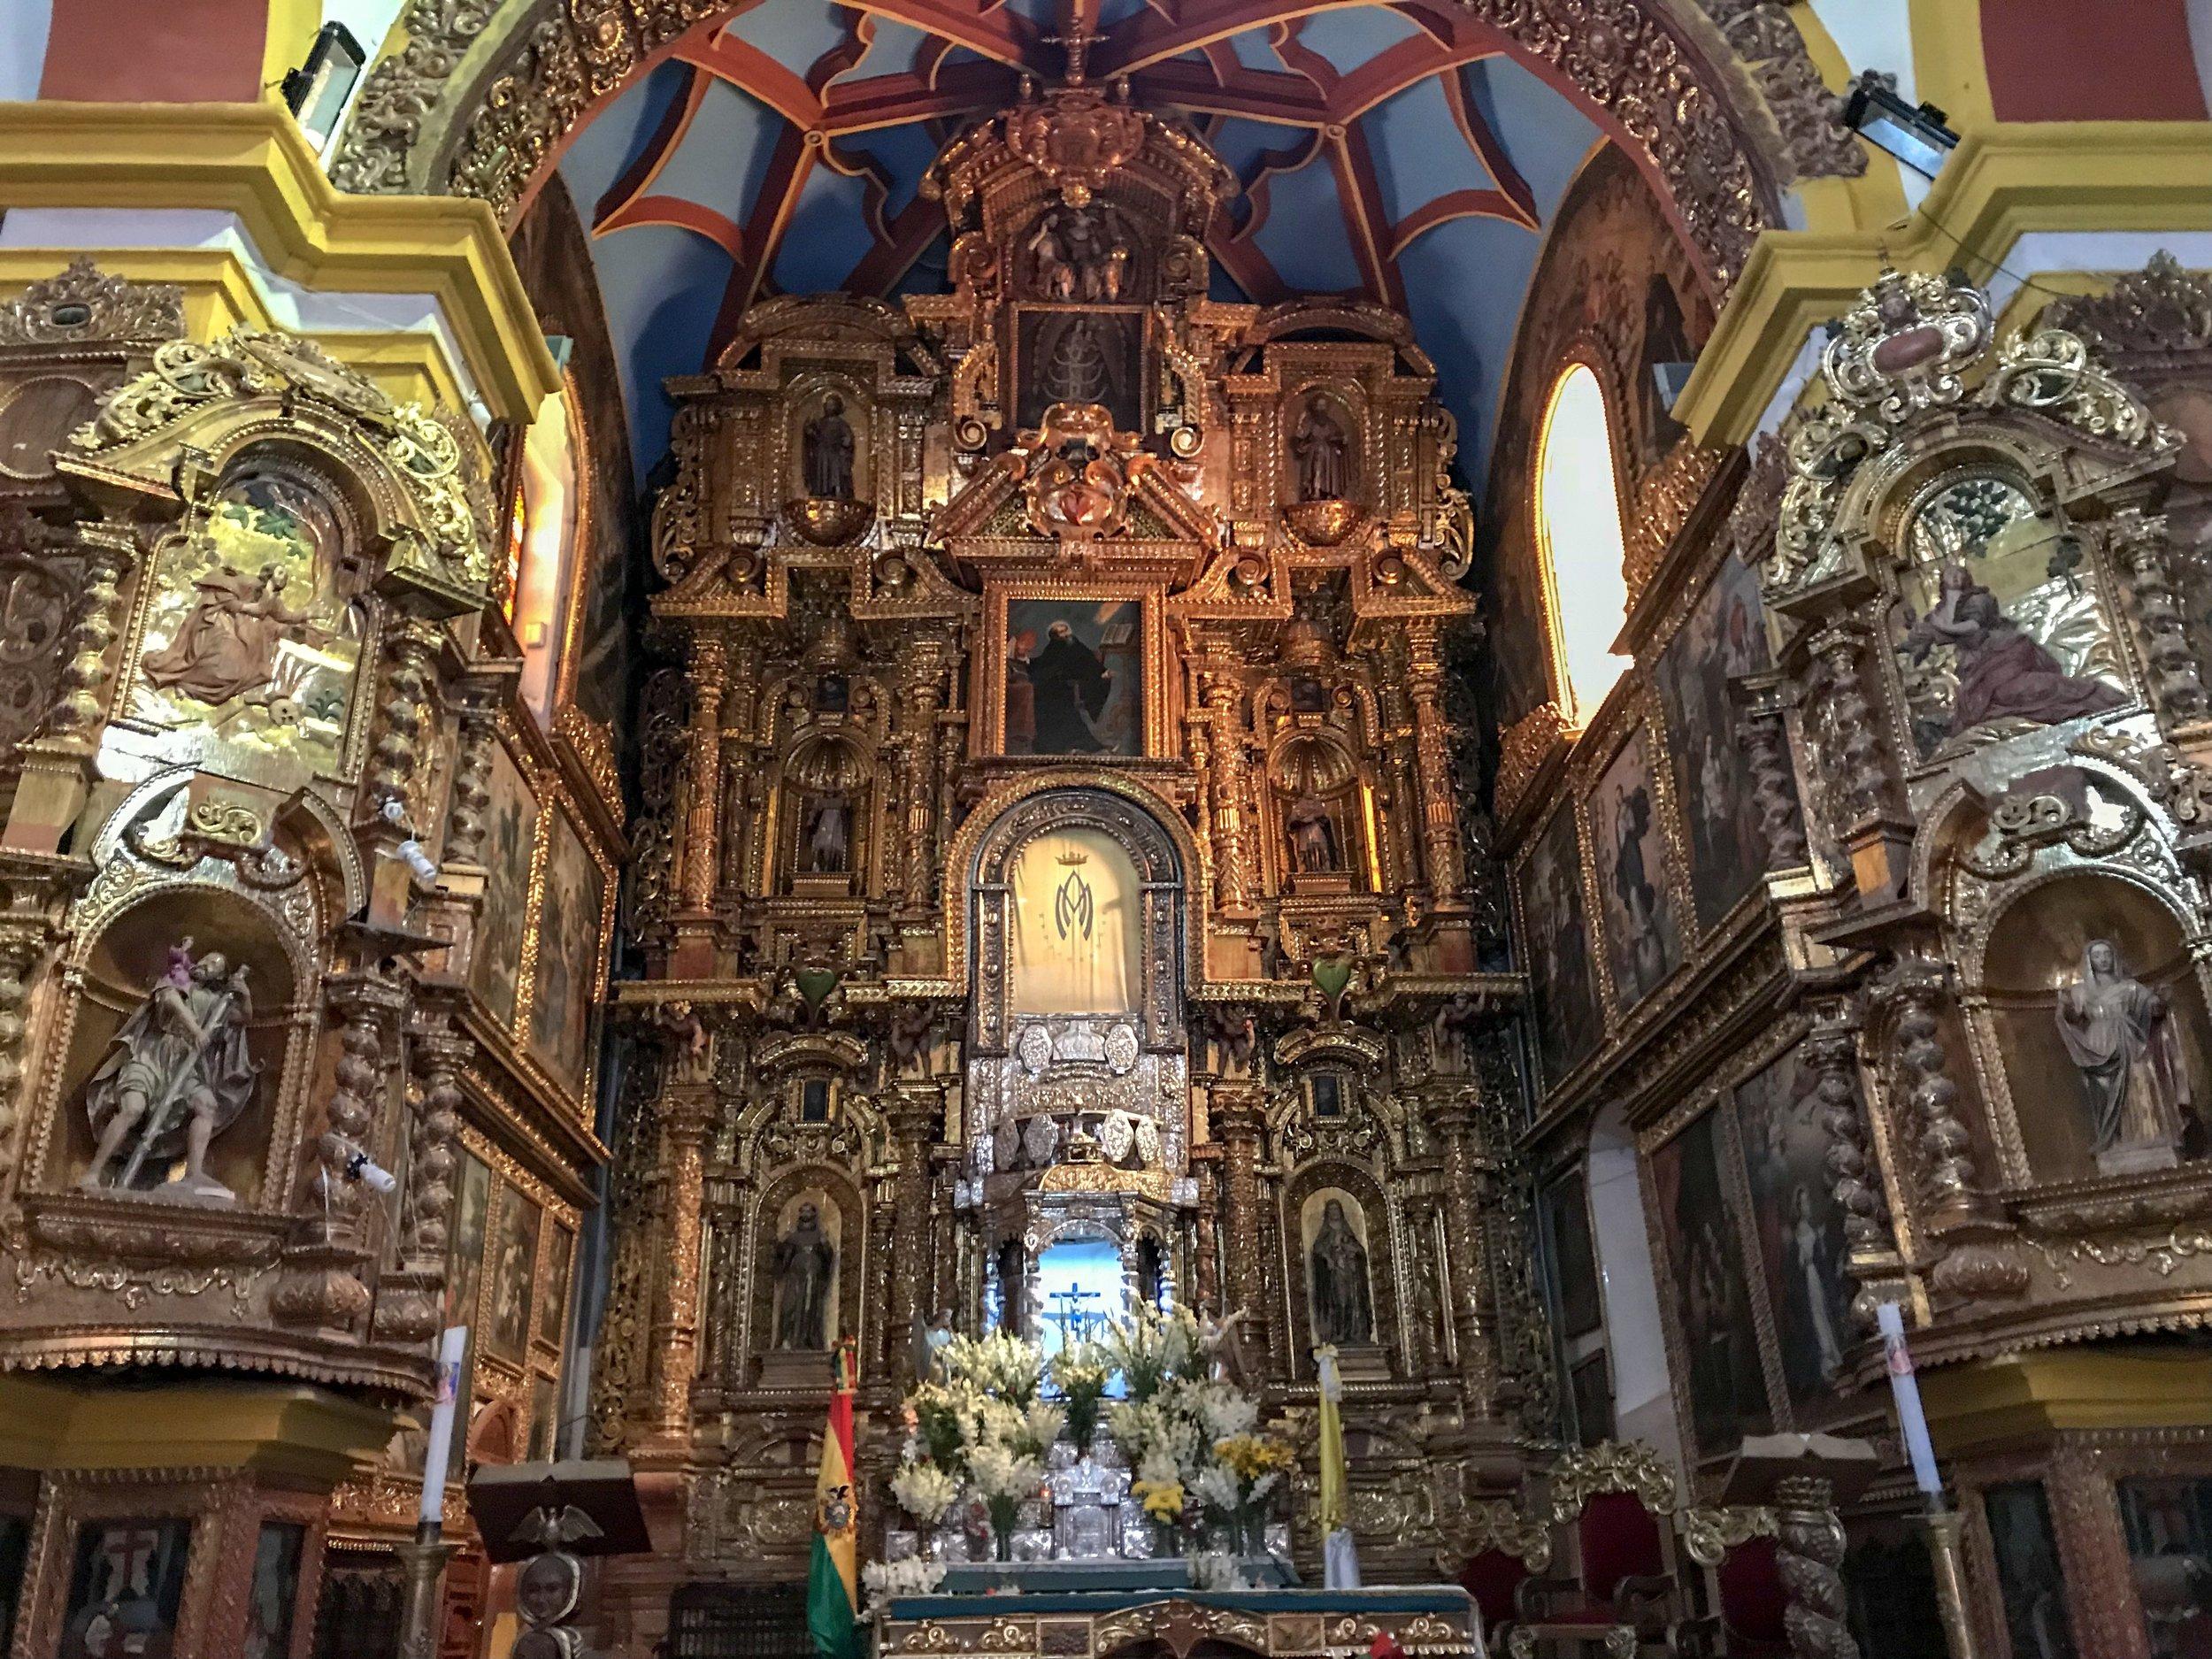 High Altar of Basilica of Our Lady of Copacabana